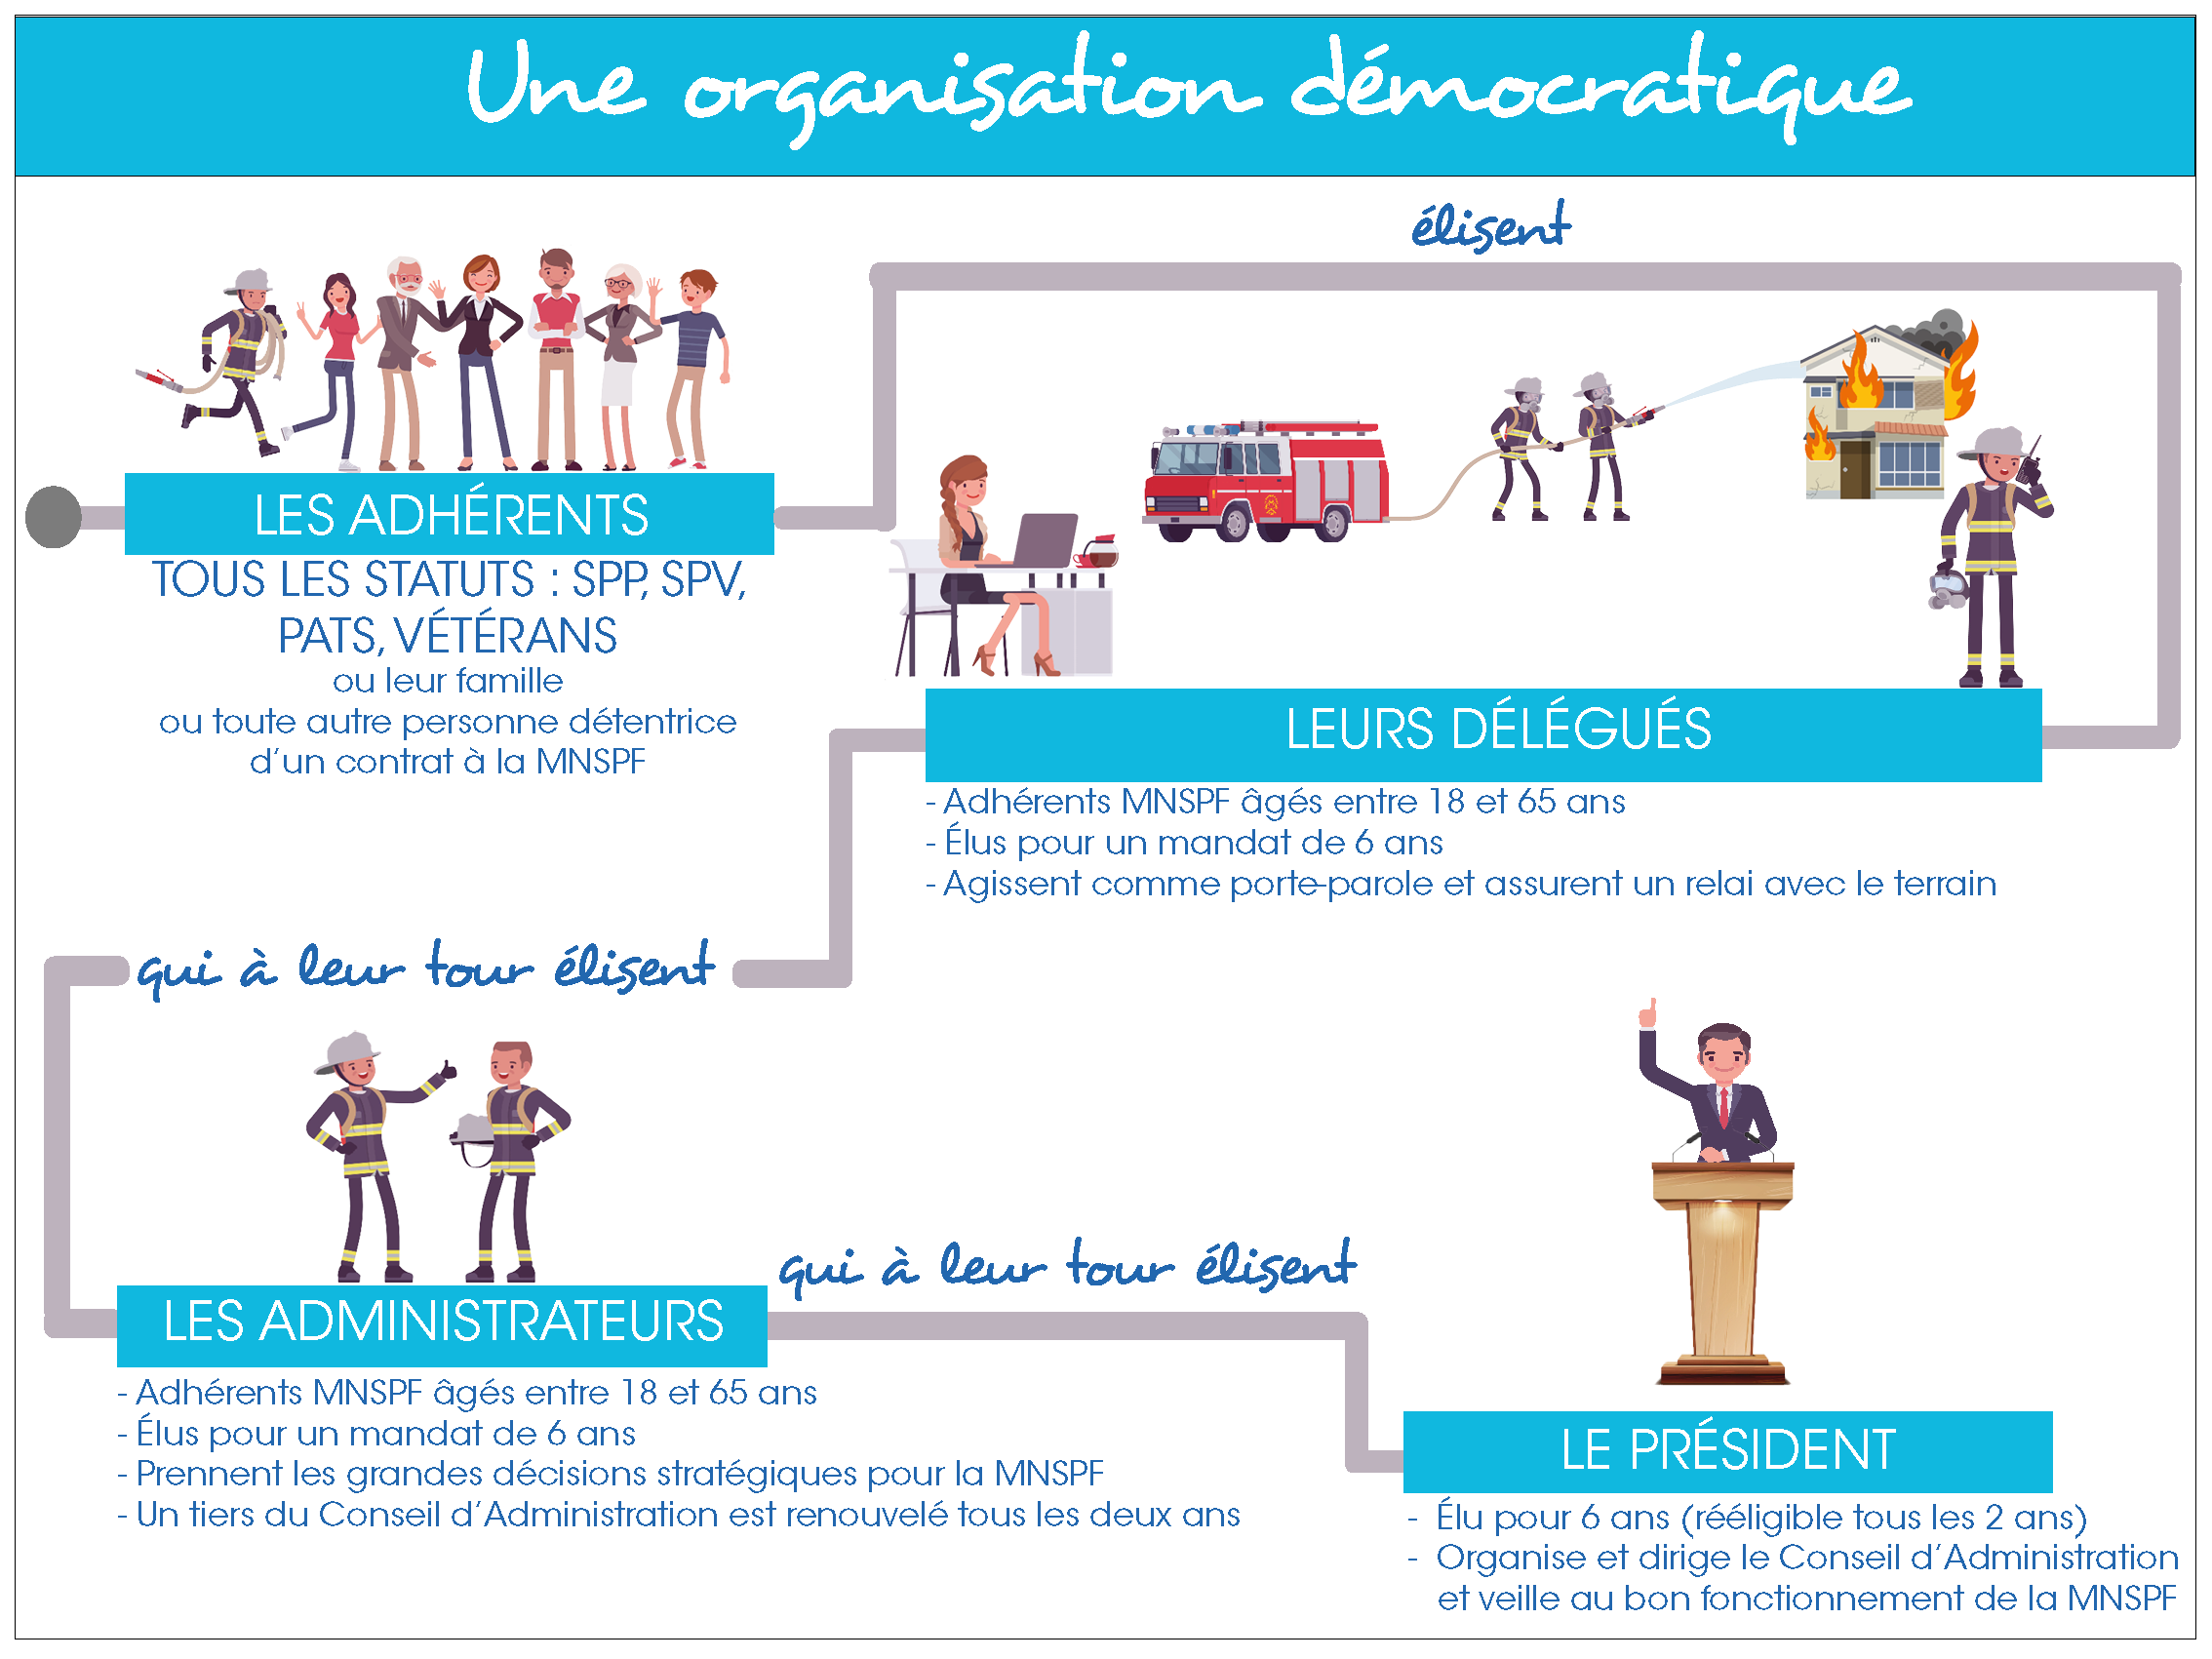 Infographie_organisation_démocratique